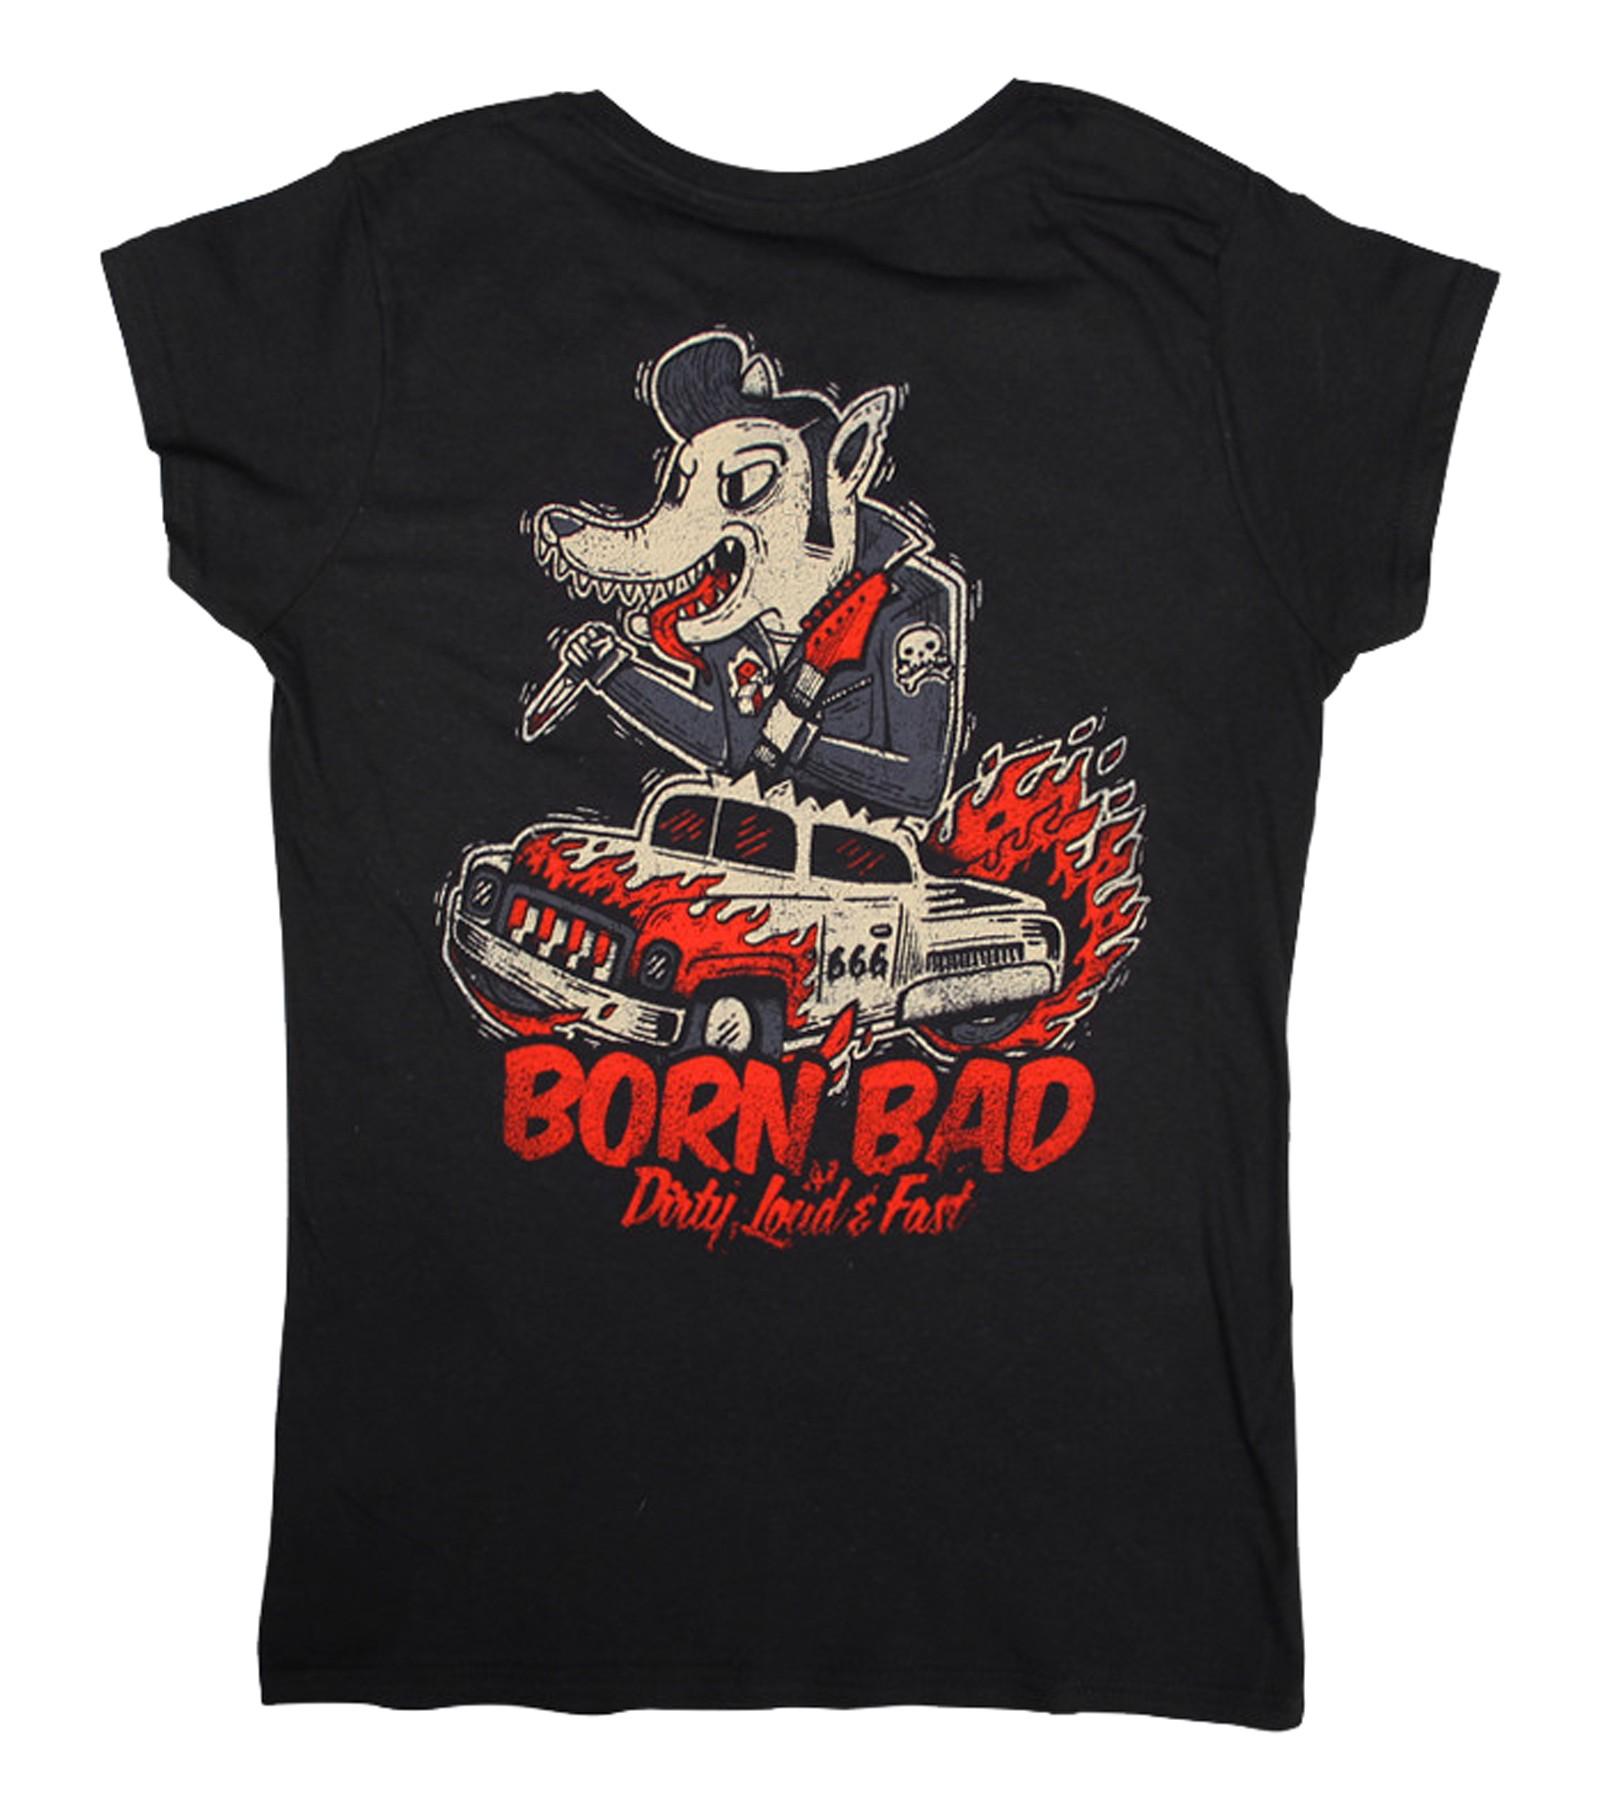 La Marca Del Diablo - Born Bad T-Shirt